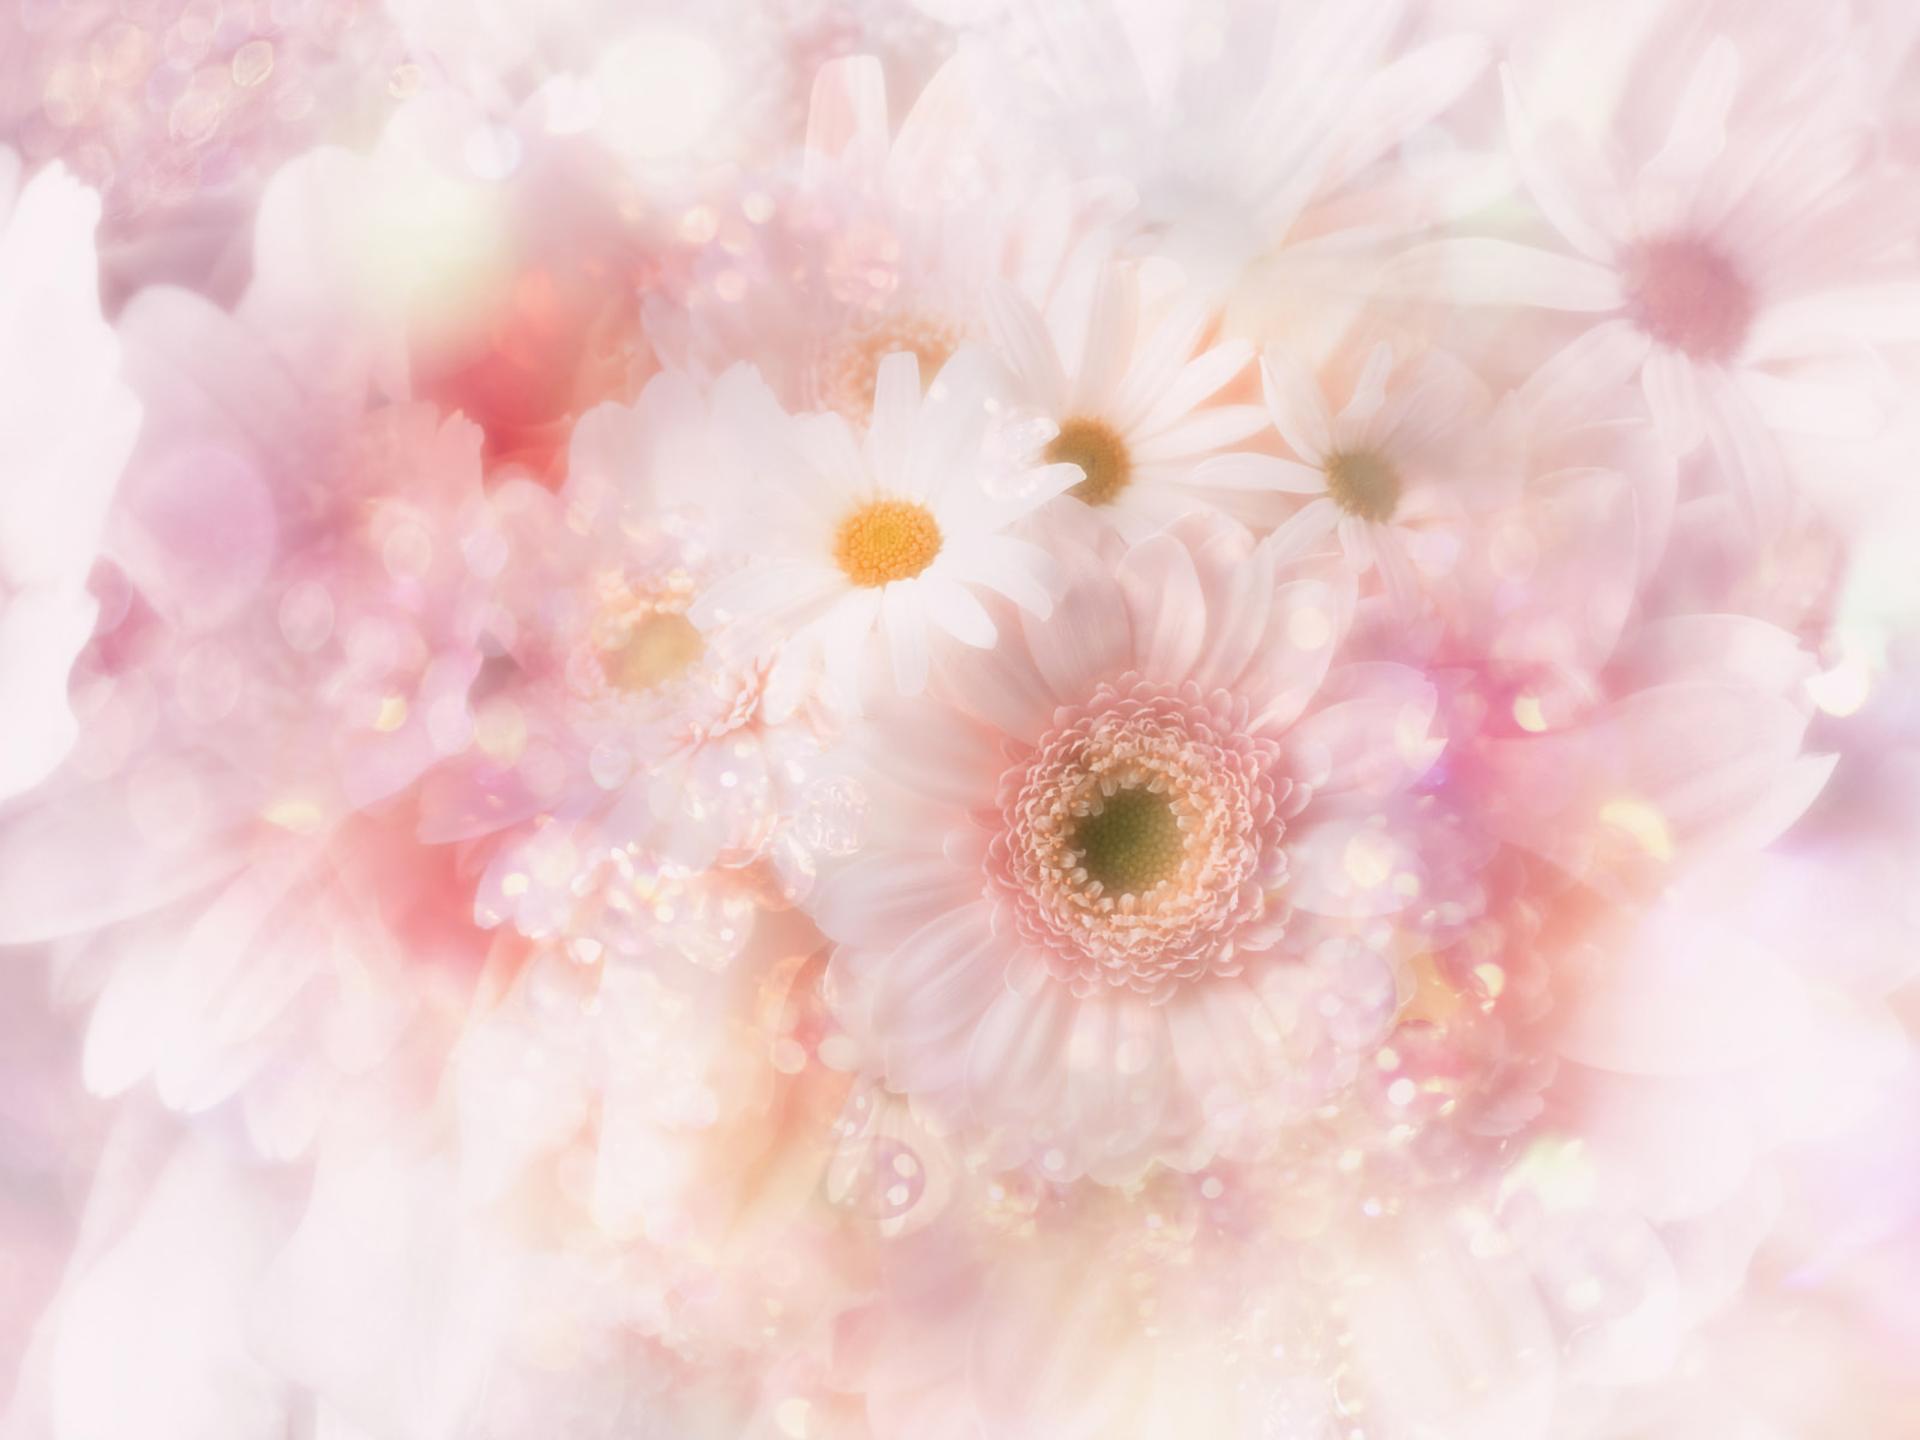 Soft Pink Floral Art Hd Wallpaper Background Image 1920x1440